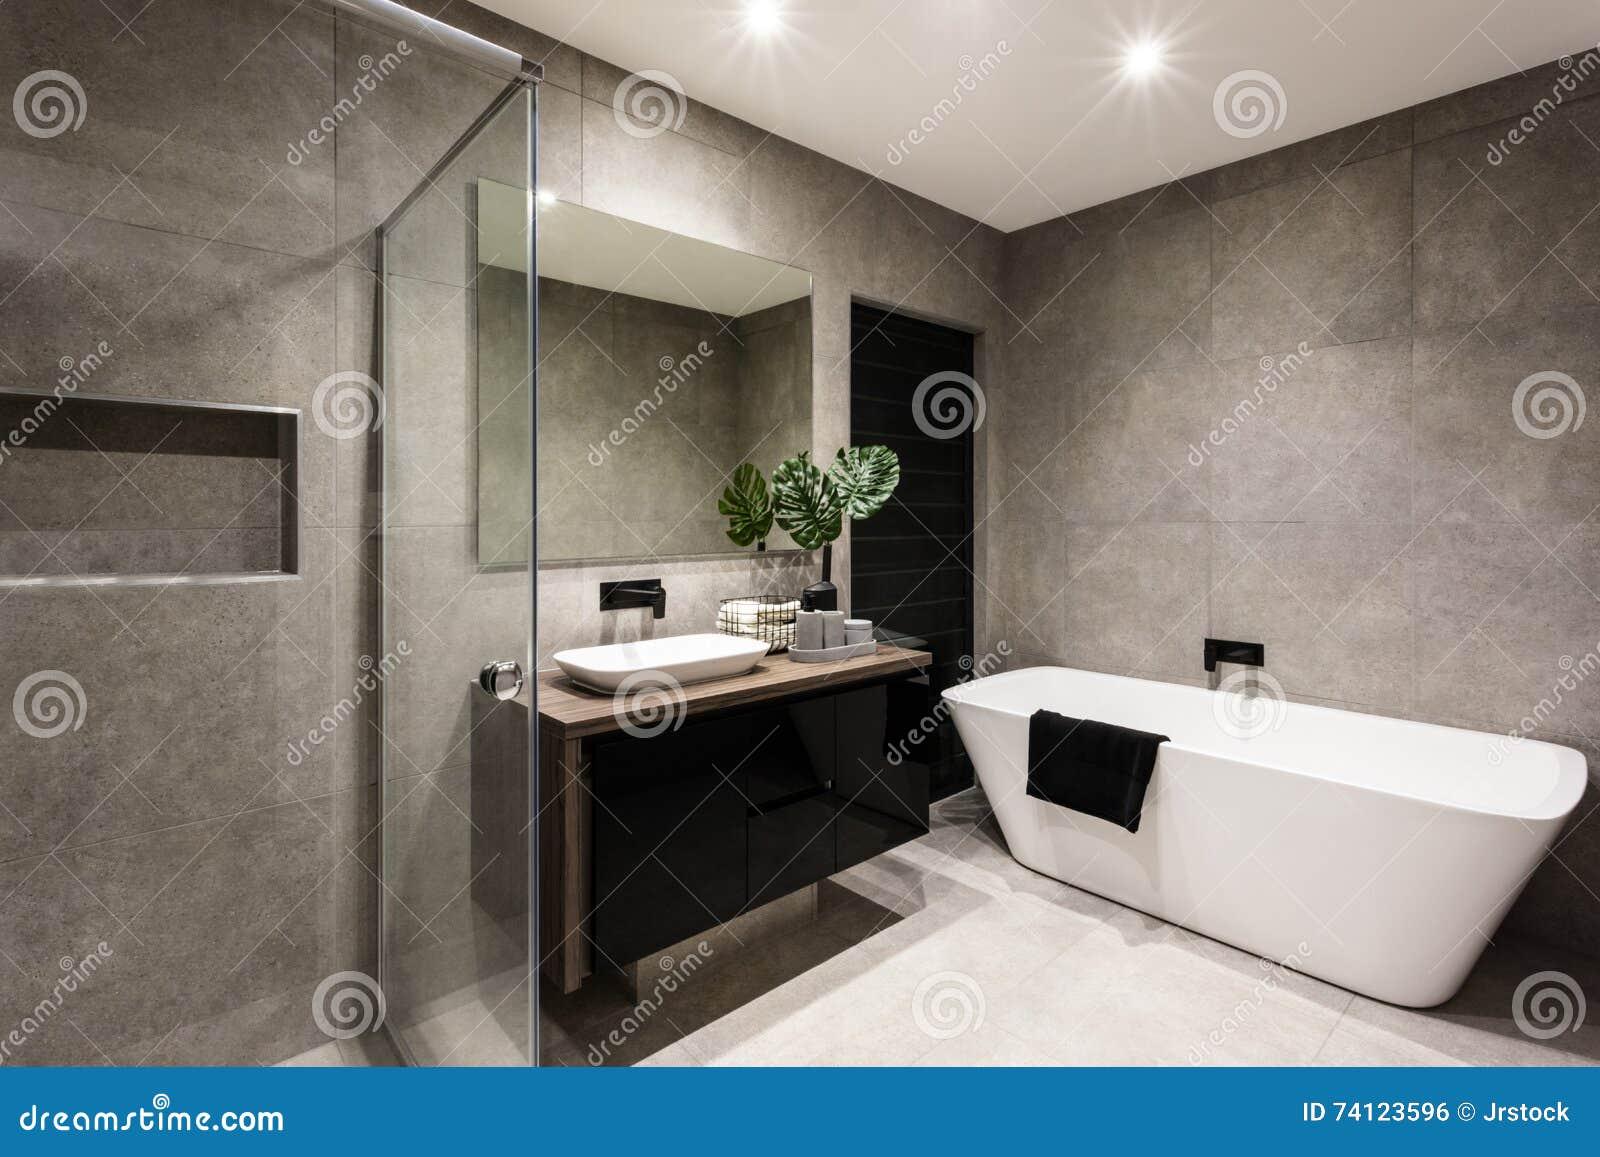 Vasche Da Bagno Moderne : Vasca da bagno scegli ora una vasca da bagno